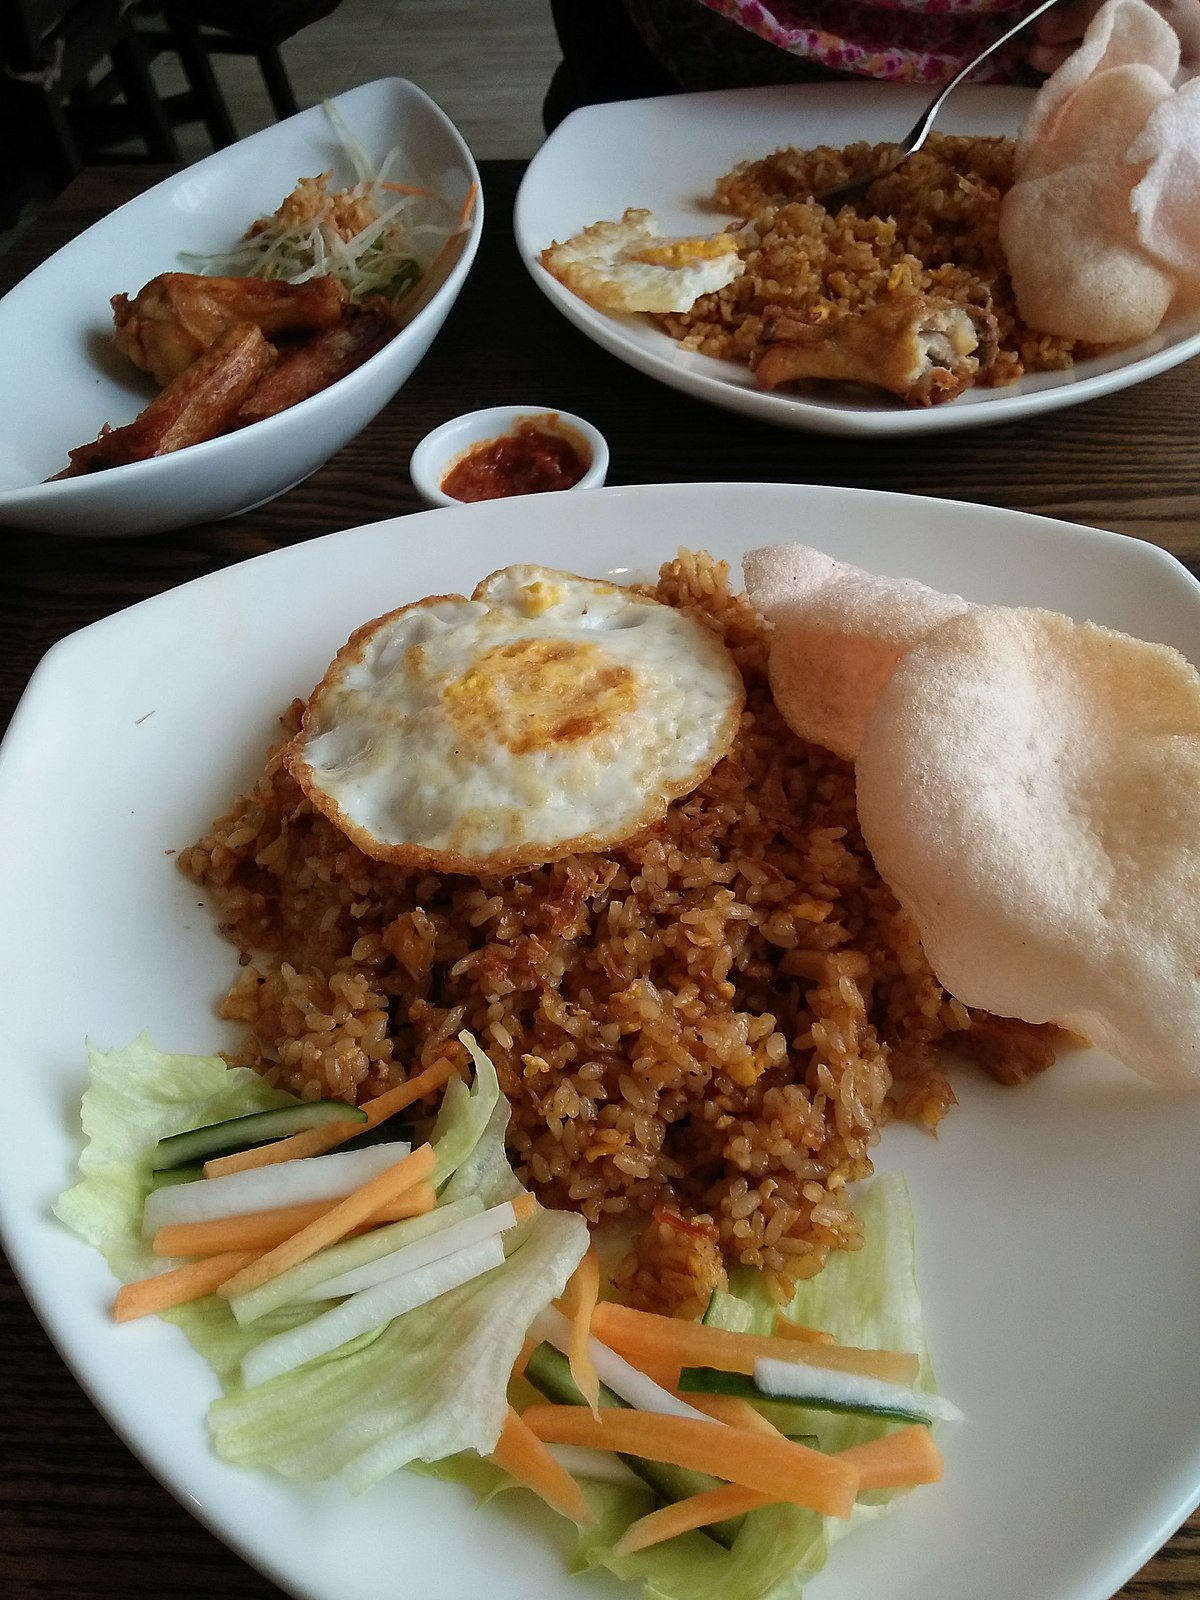 Resep Masakan India Vegetarian : resep, masakan, india, vegetarian, Goreng, Wikipedia